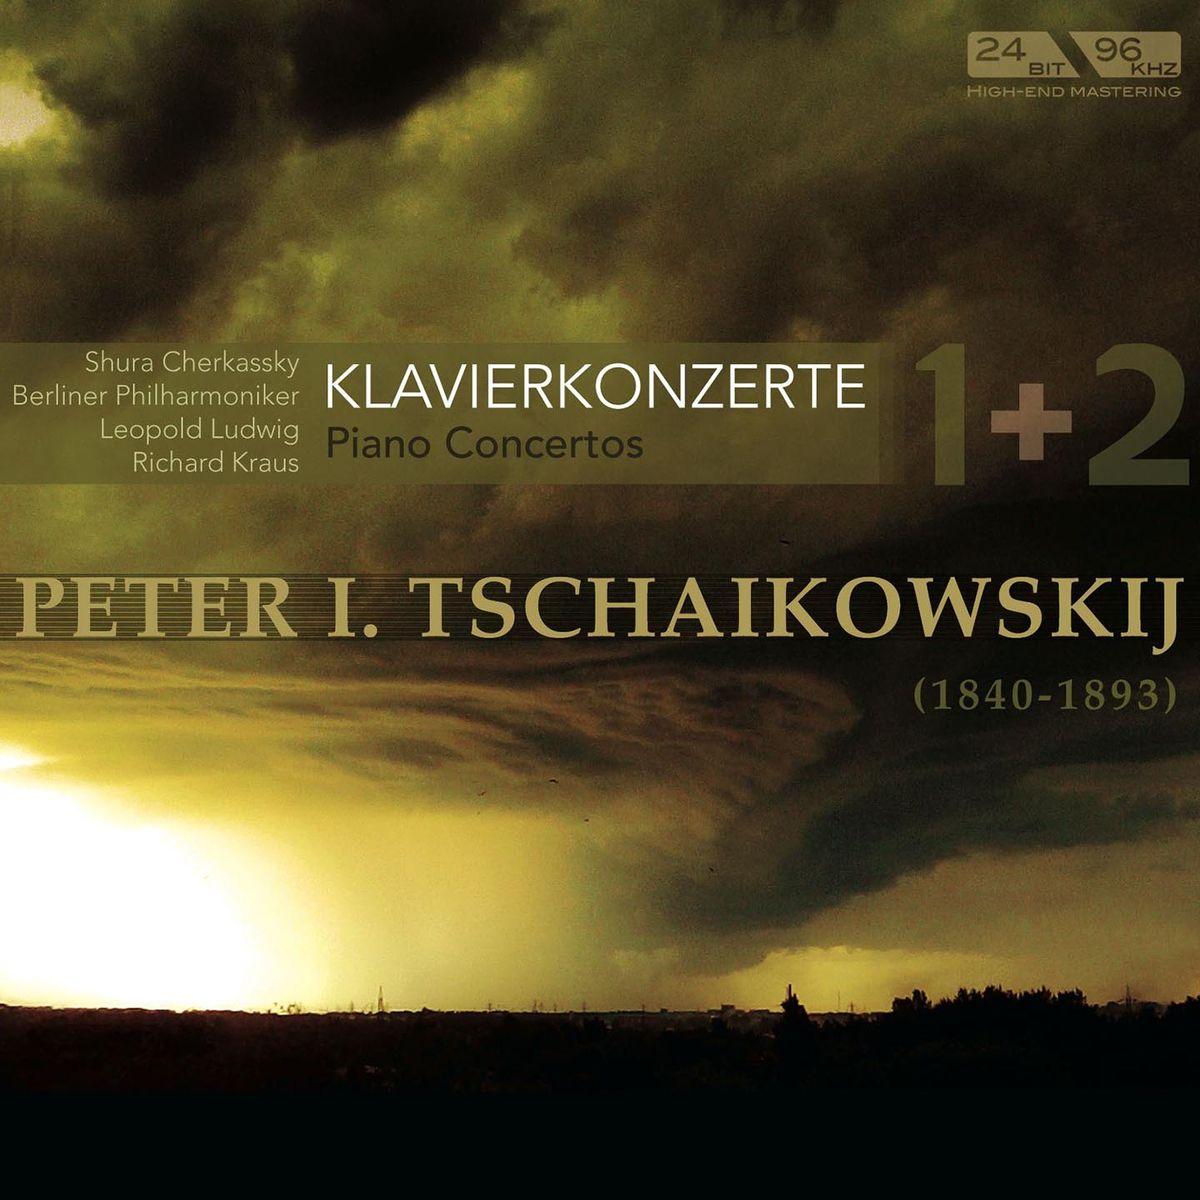 Berlin Philh. Cherkassky, Kraus Ludwig. Tchaikovsky: Klavierkonzerte 1&2 (Piano Concertos 1&2)